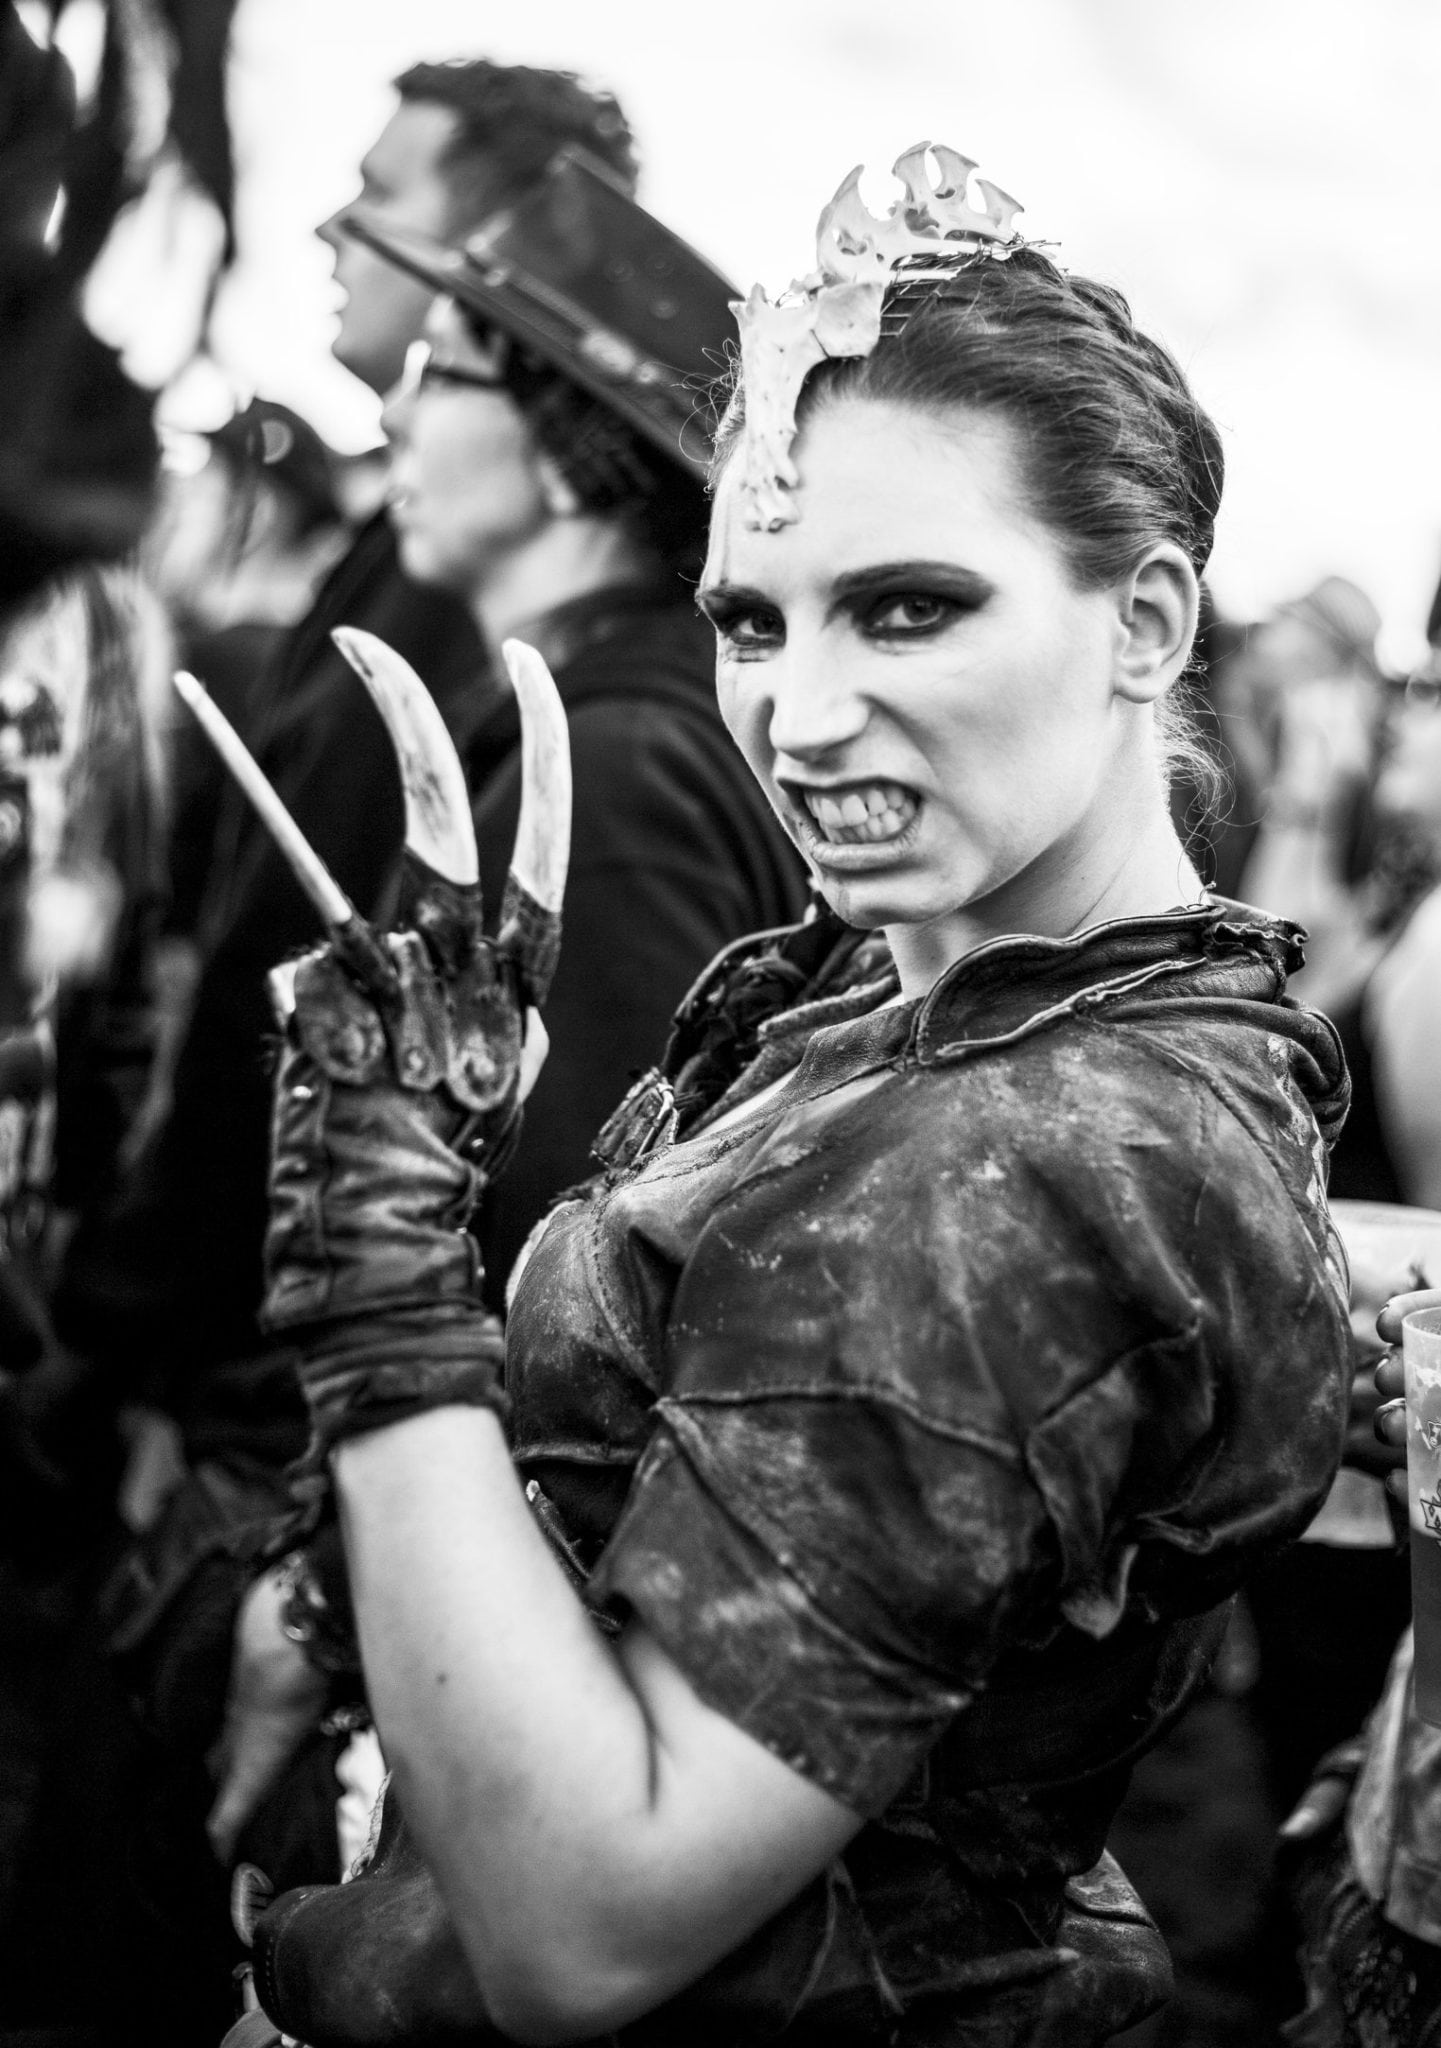 Wacken 2016-Fotoreportage